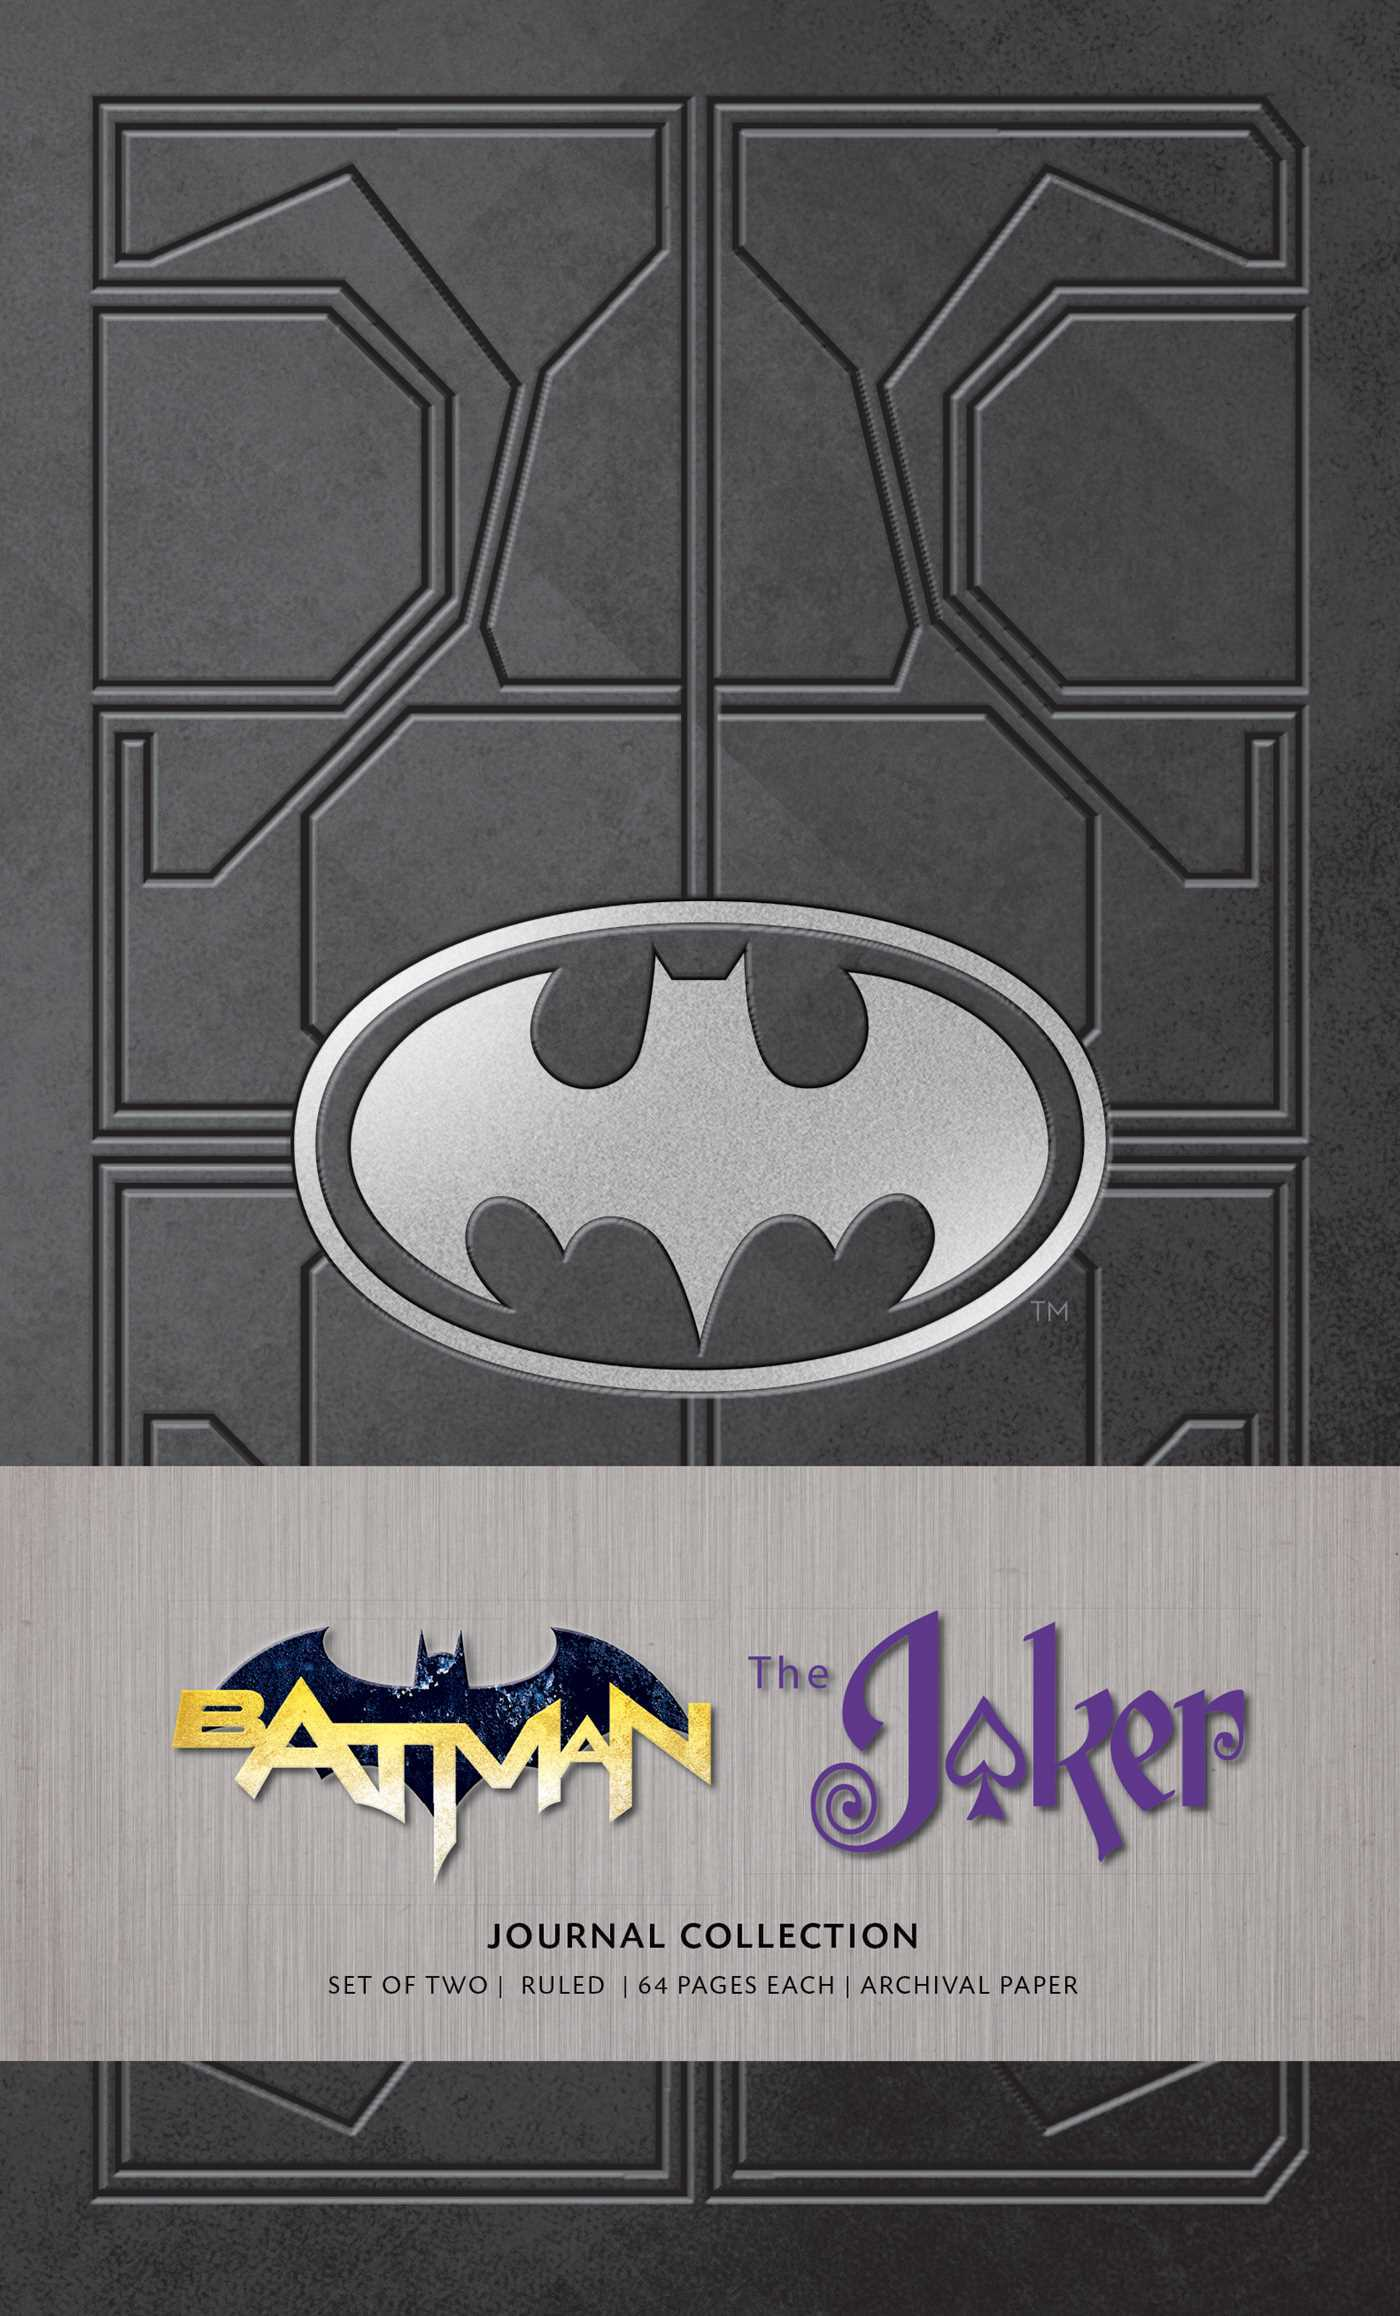 DC Comics: Character Journal Collection (Set of 2): Batman and Joker